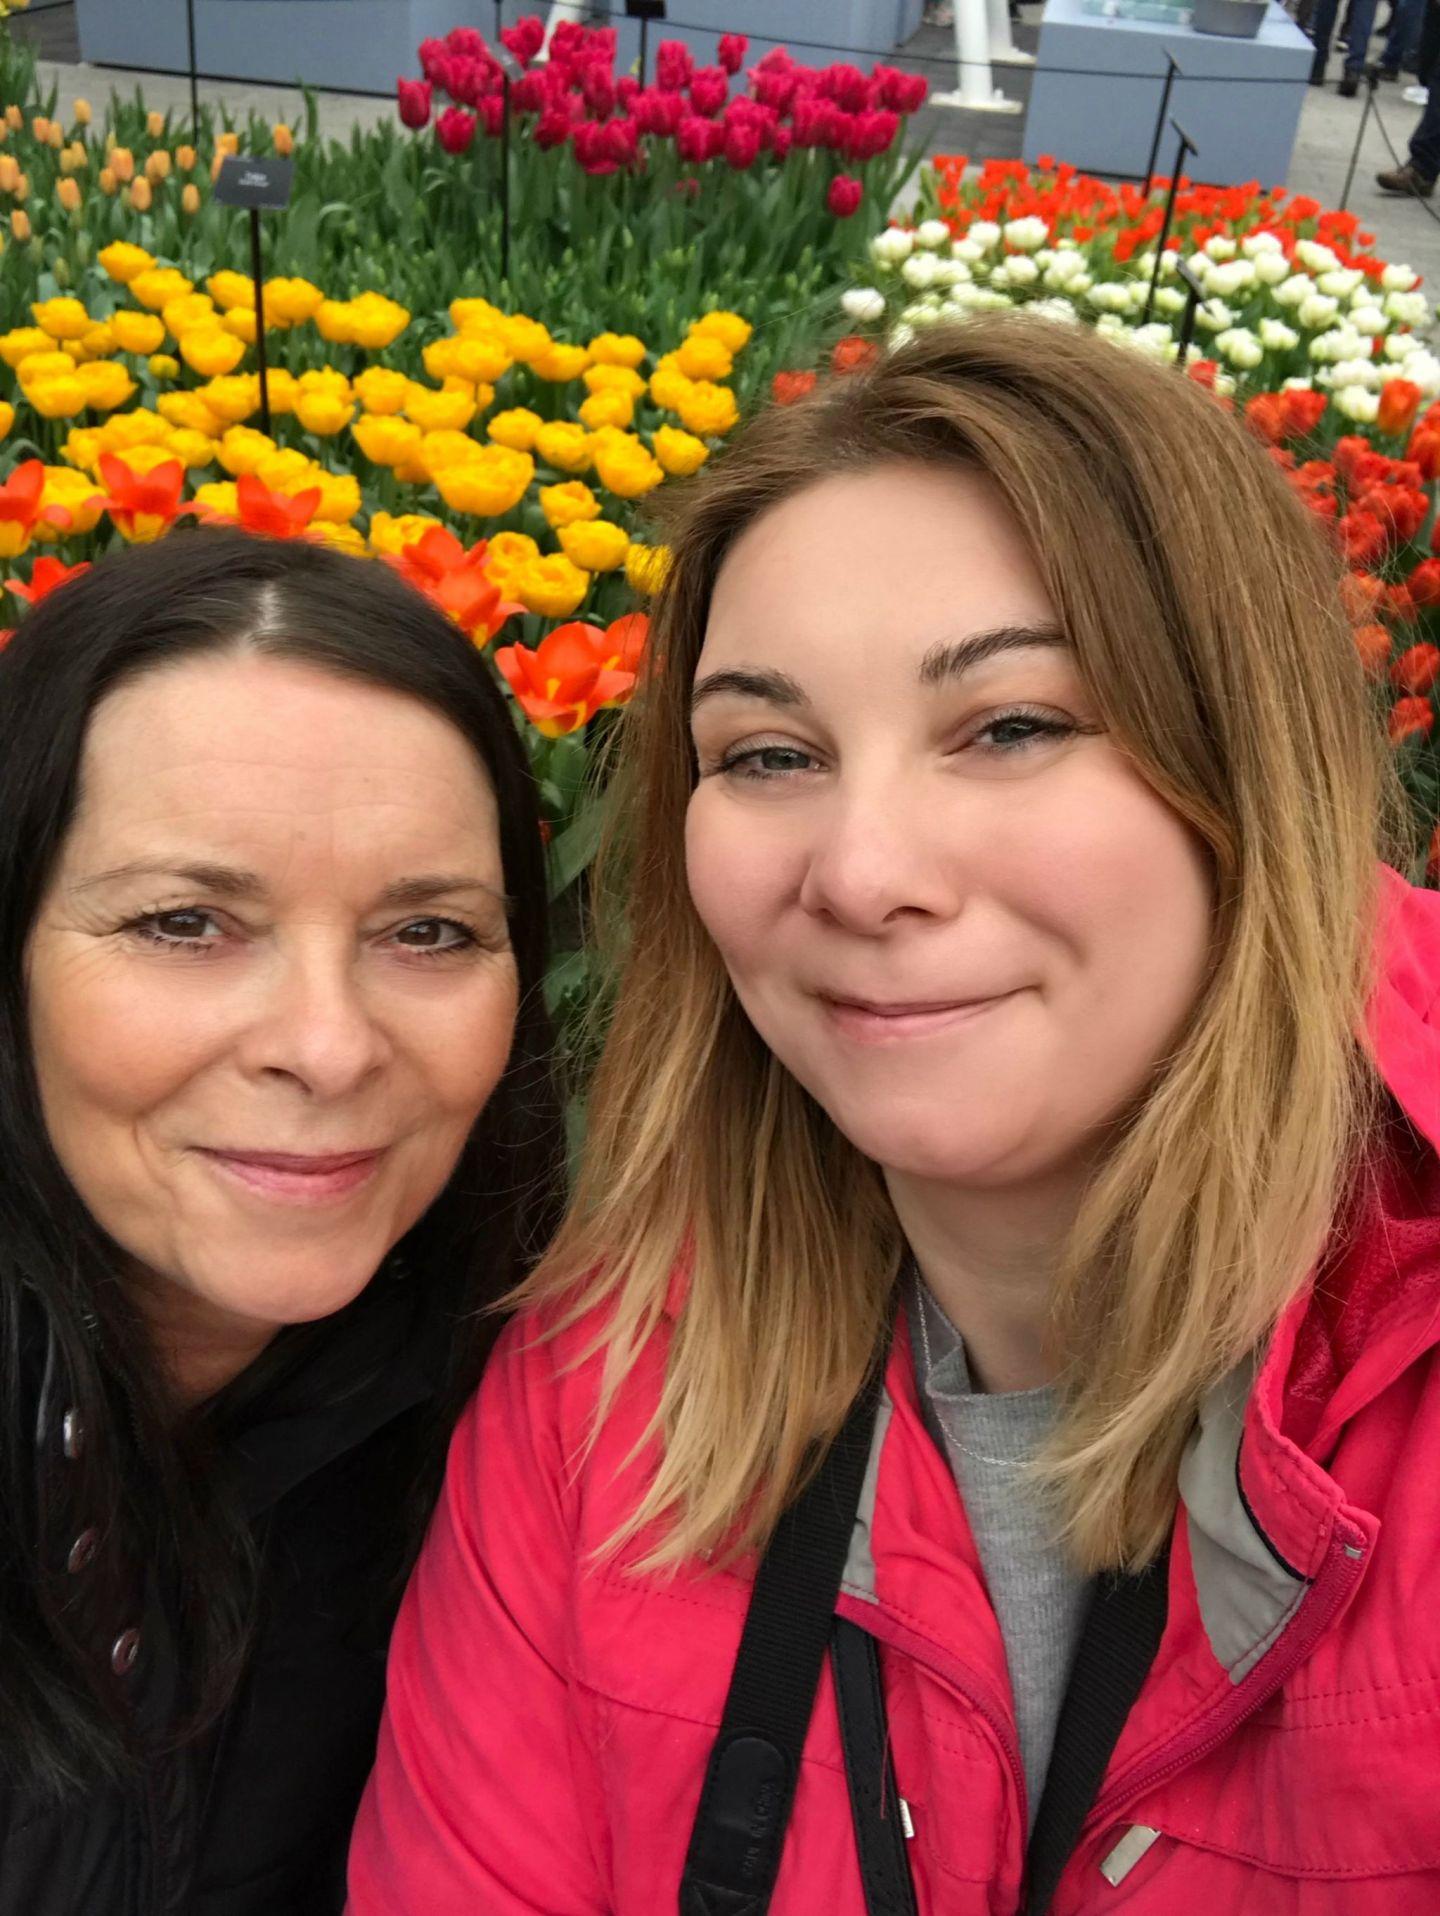 Me and Mum at Keukenhof